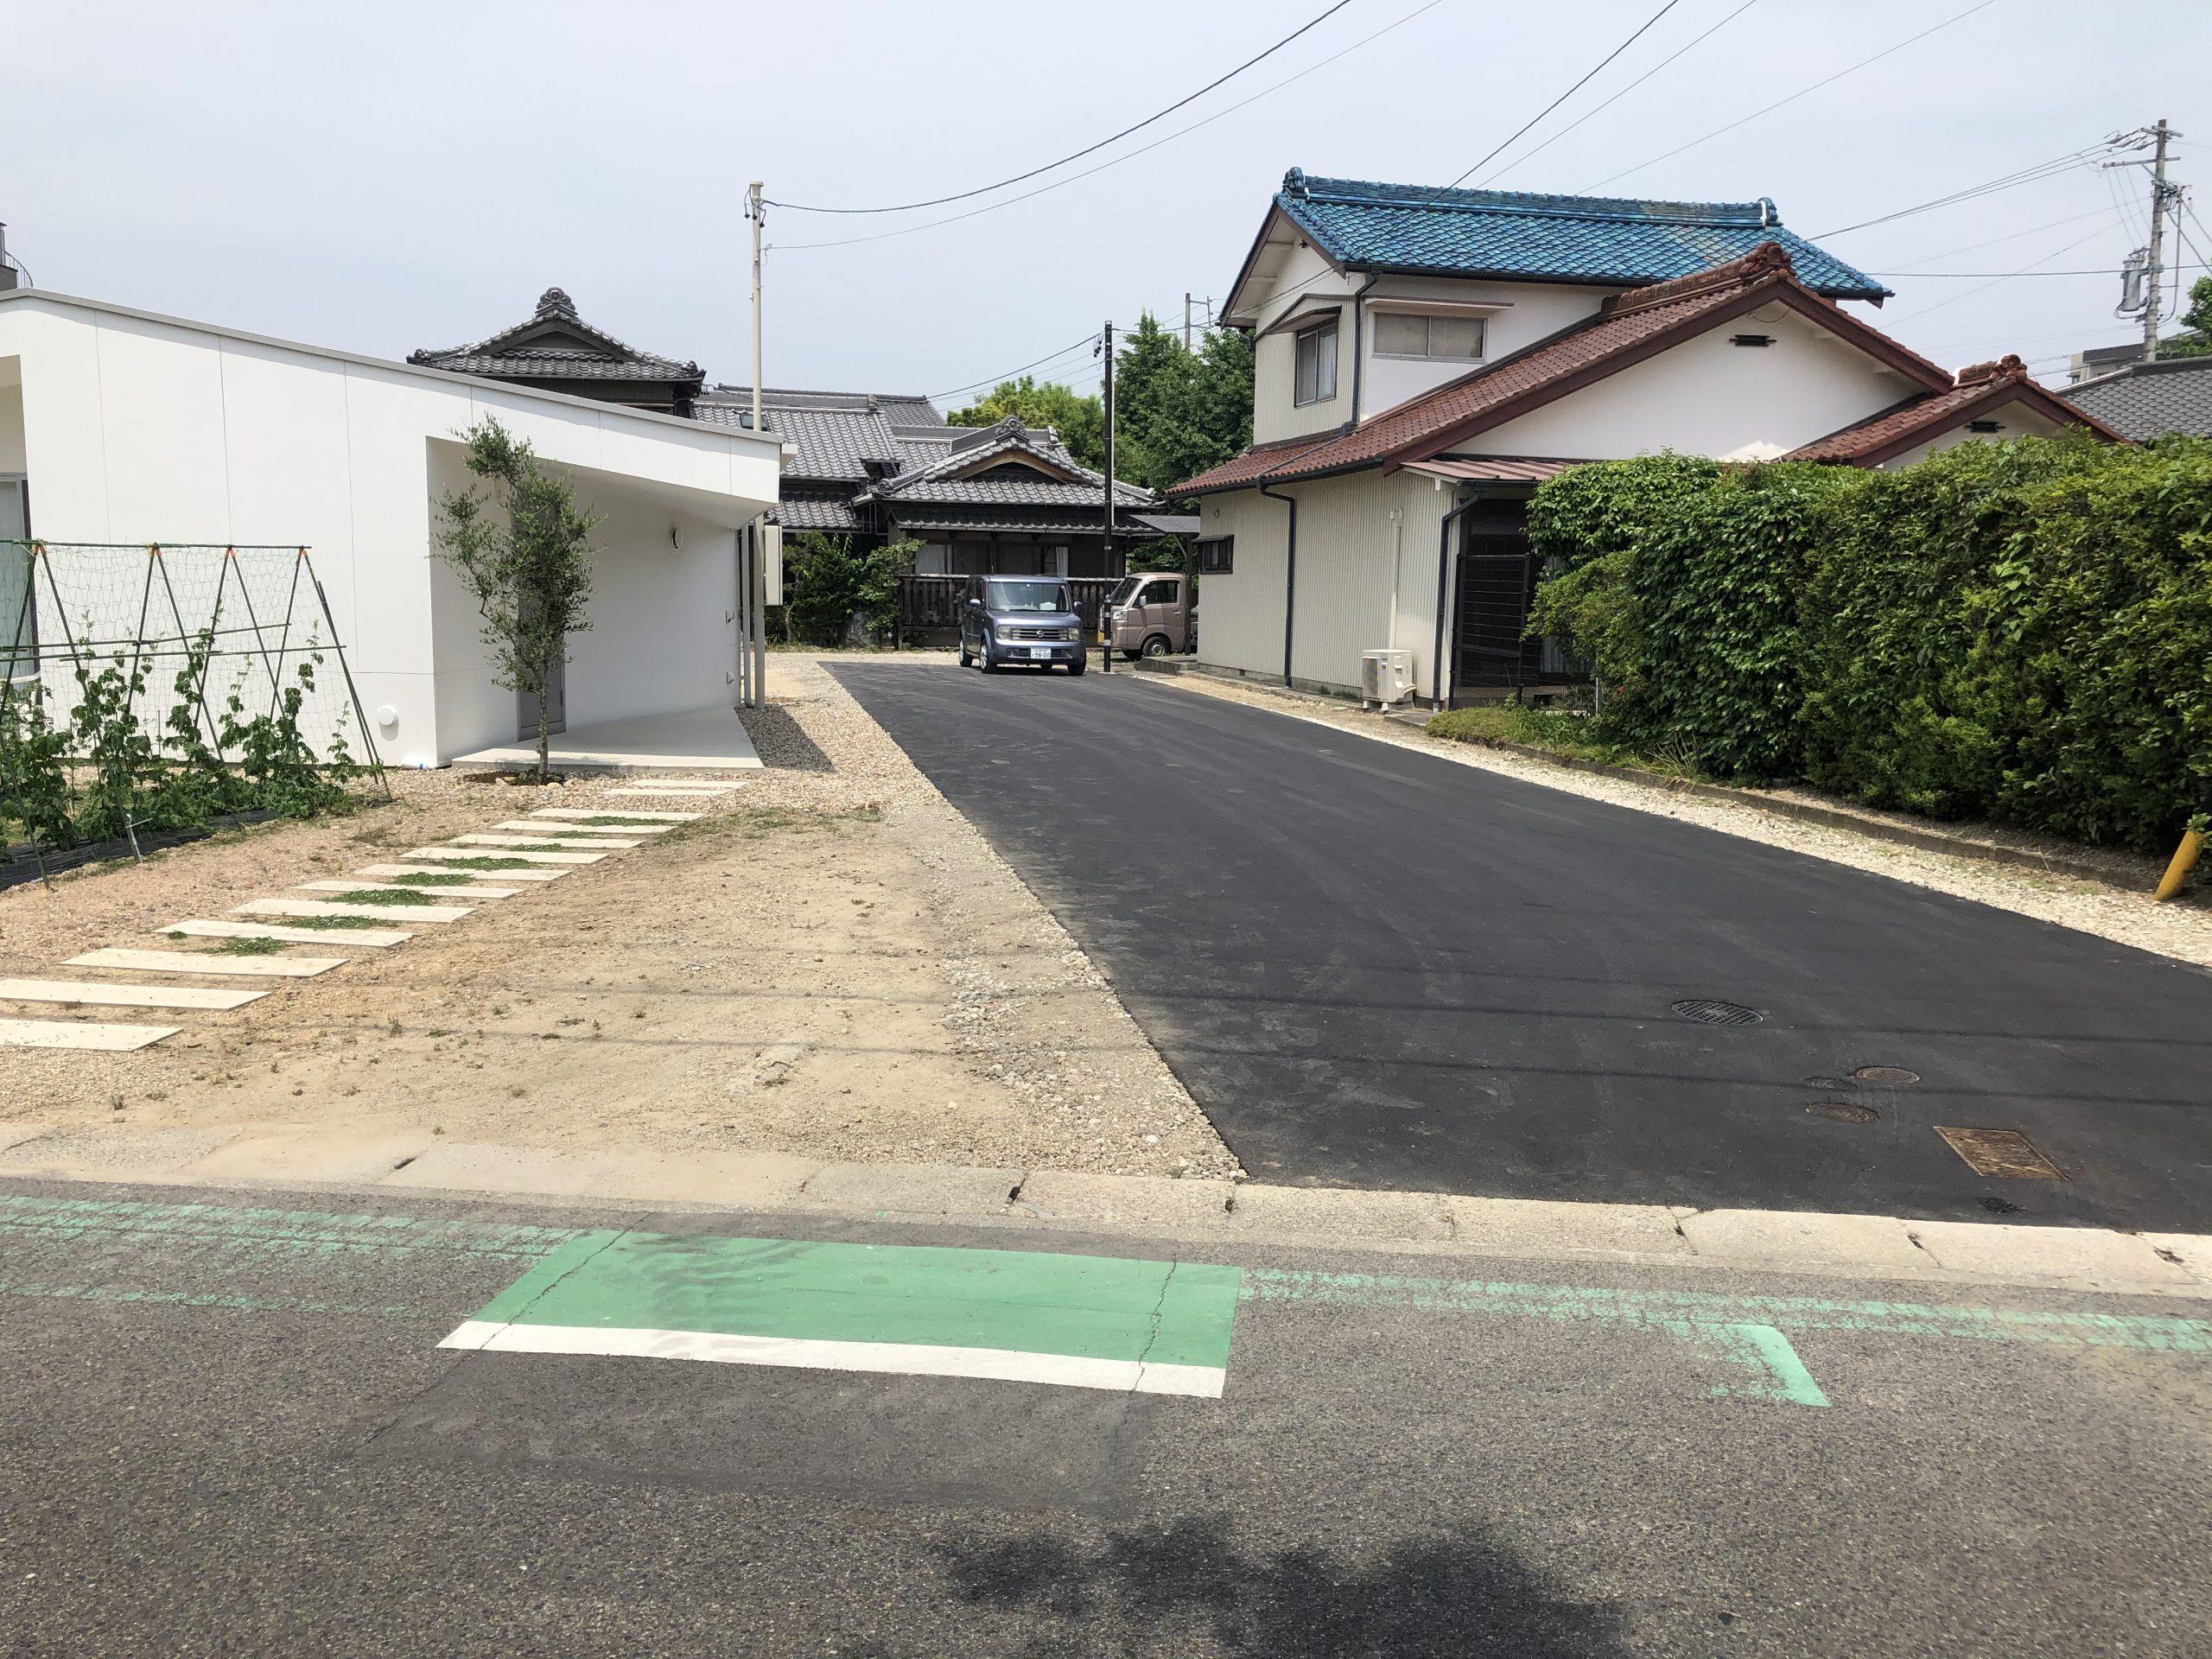 【愛知県長久手市】自宅新築後、駐車場も綺麗に舗装